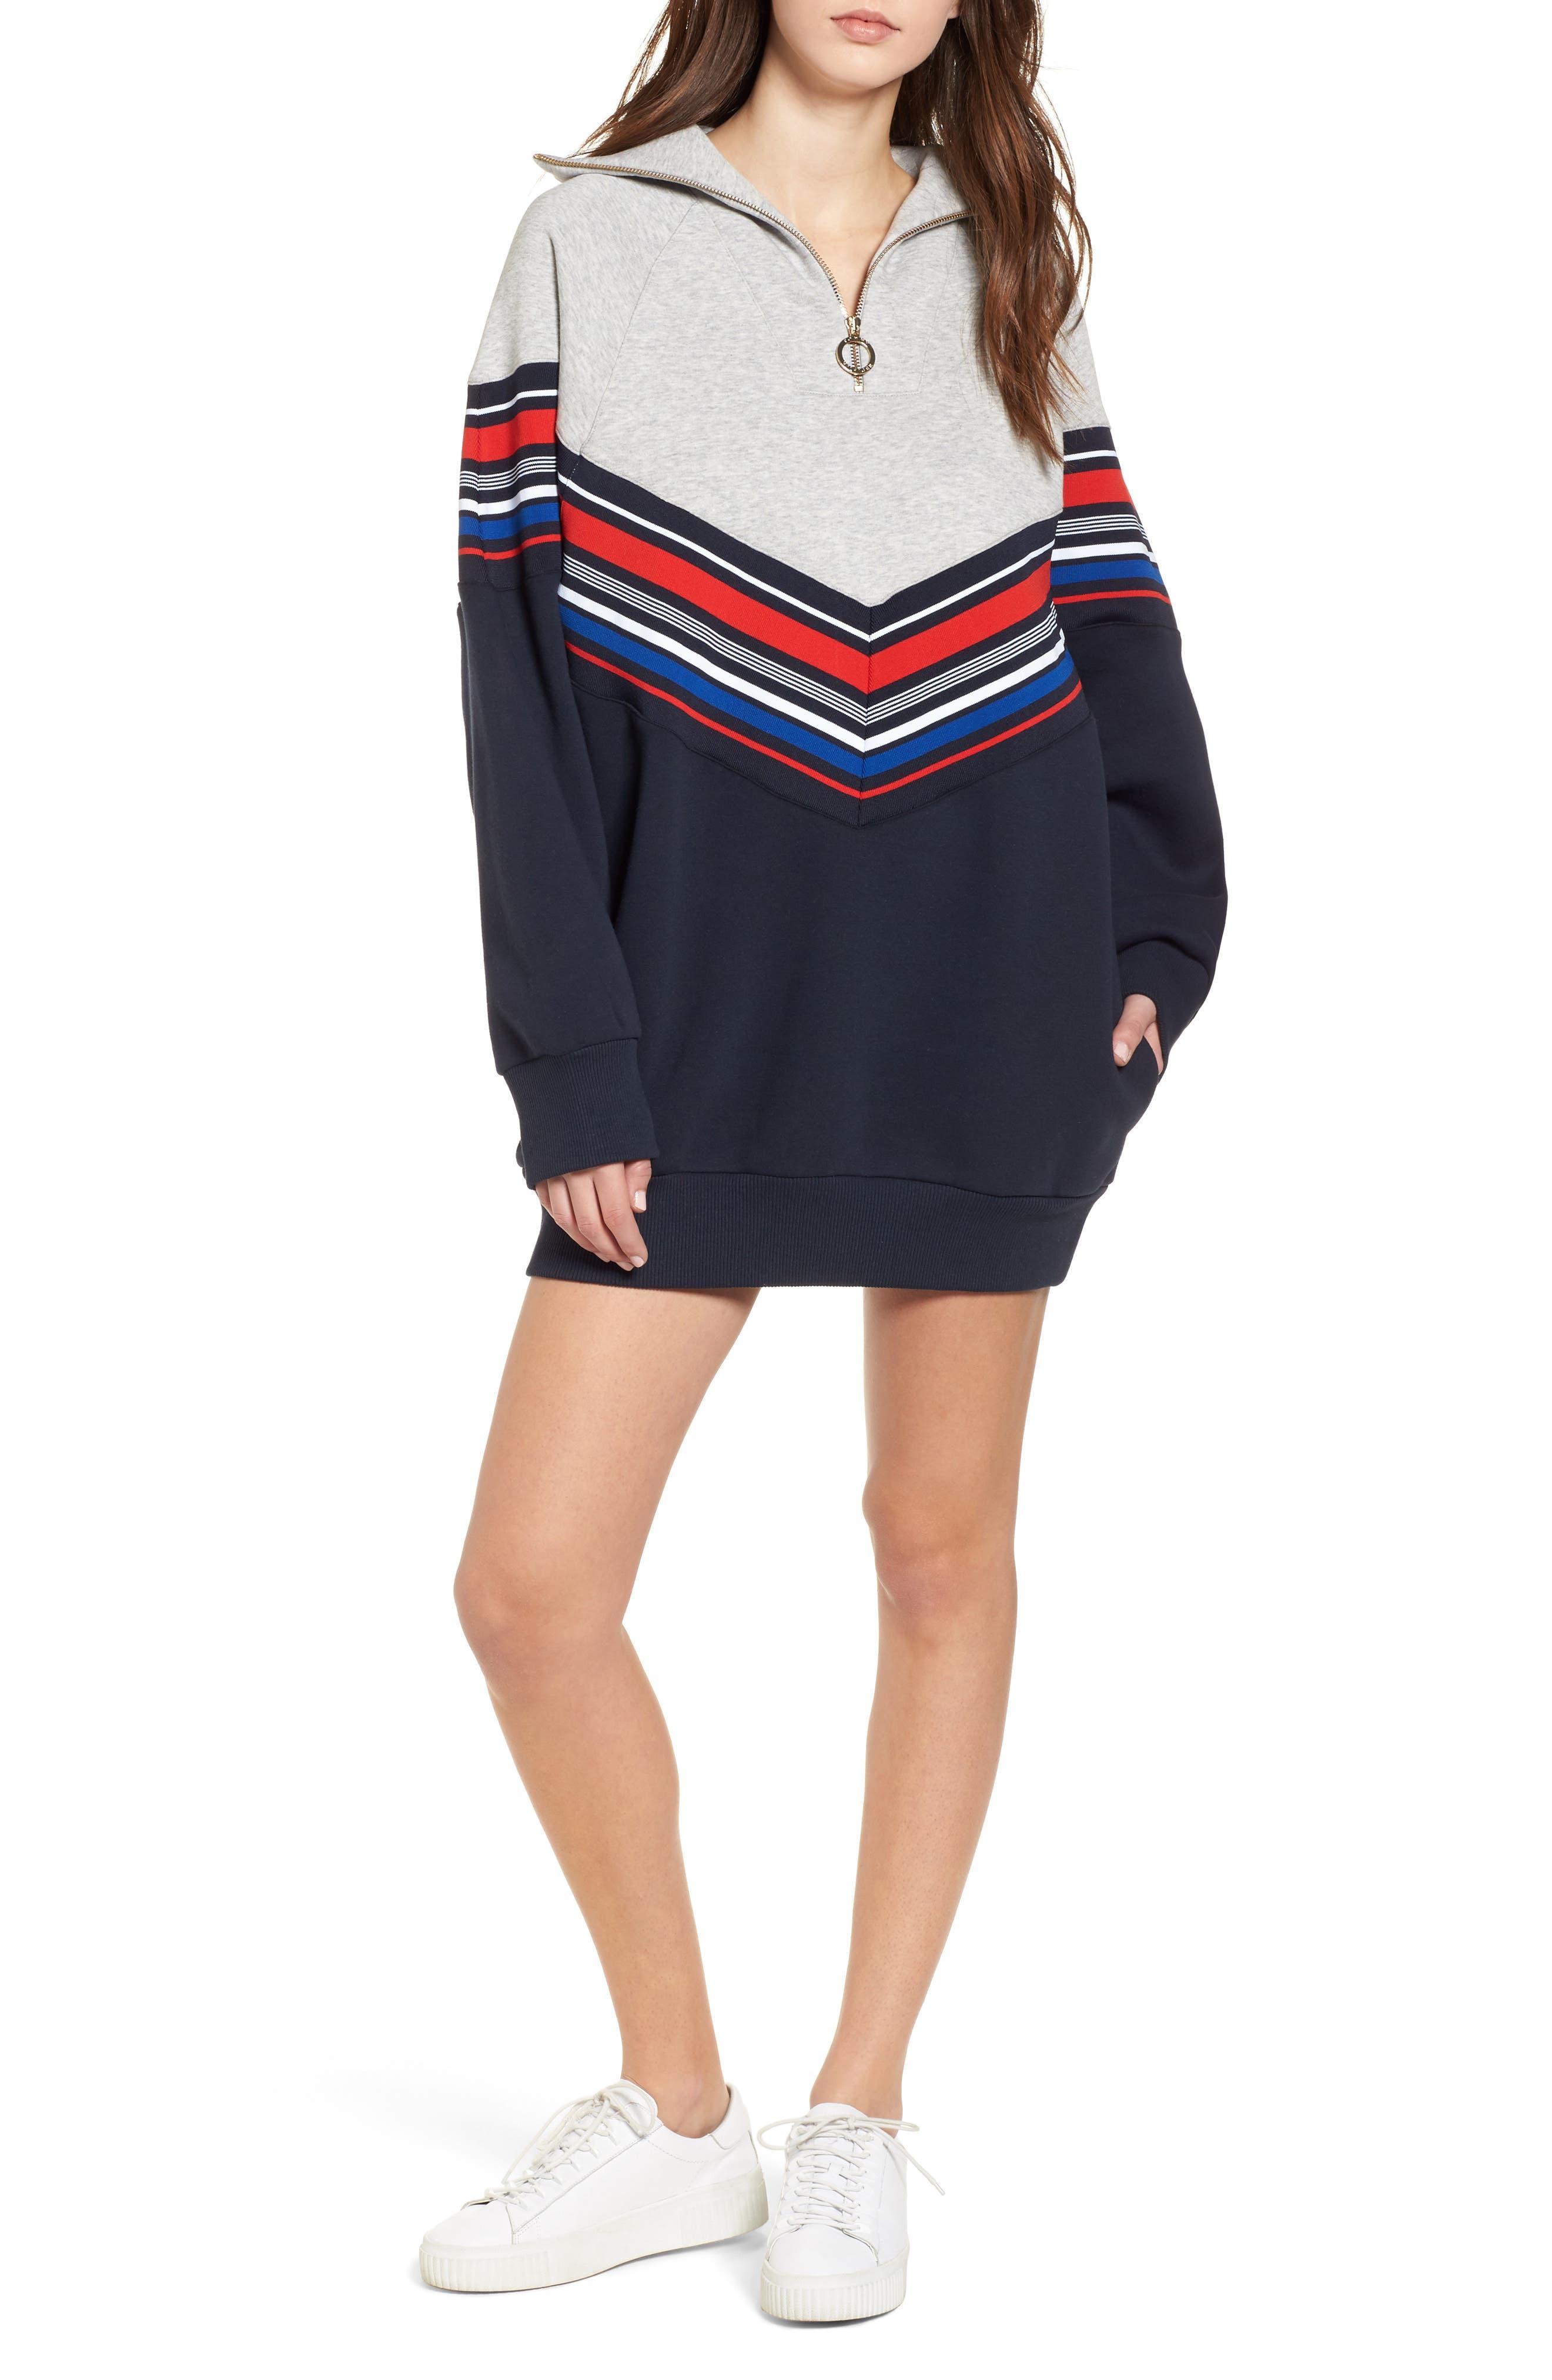 x Gigi Hadid Racing Sweatshirt Dress,                             Main thumbnail 1, color,                             Midnight/ Hthr